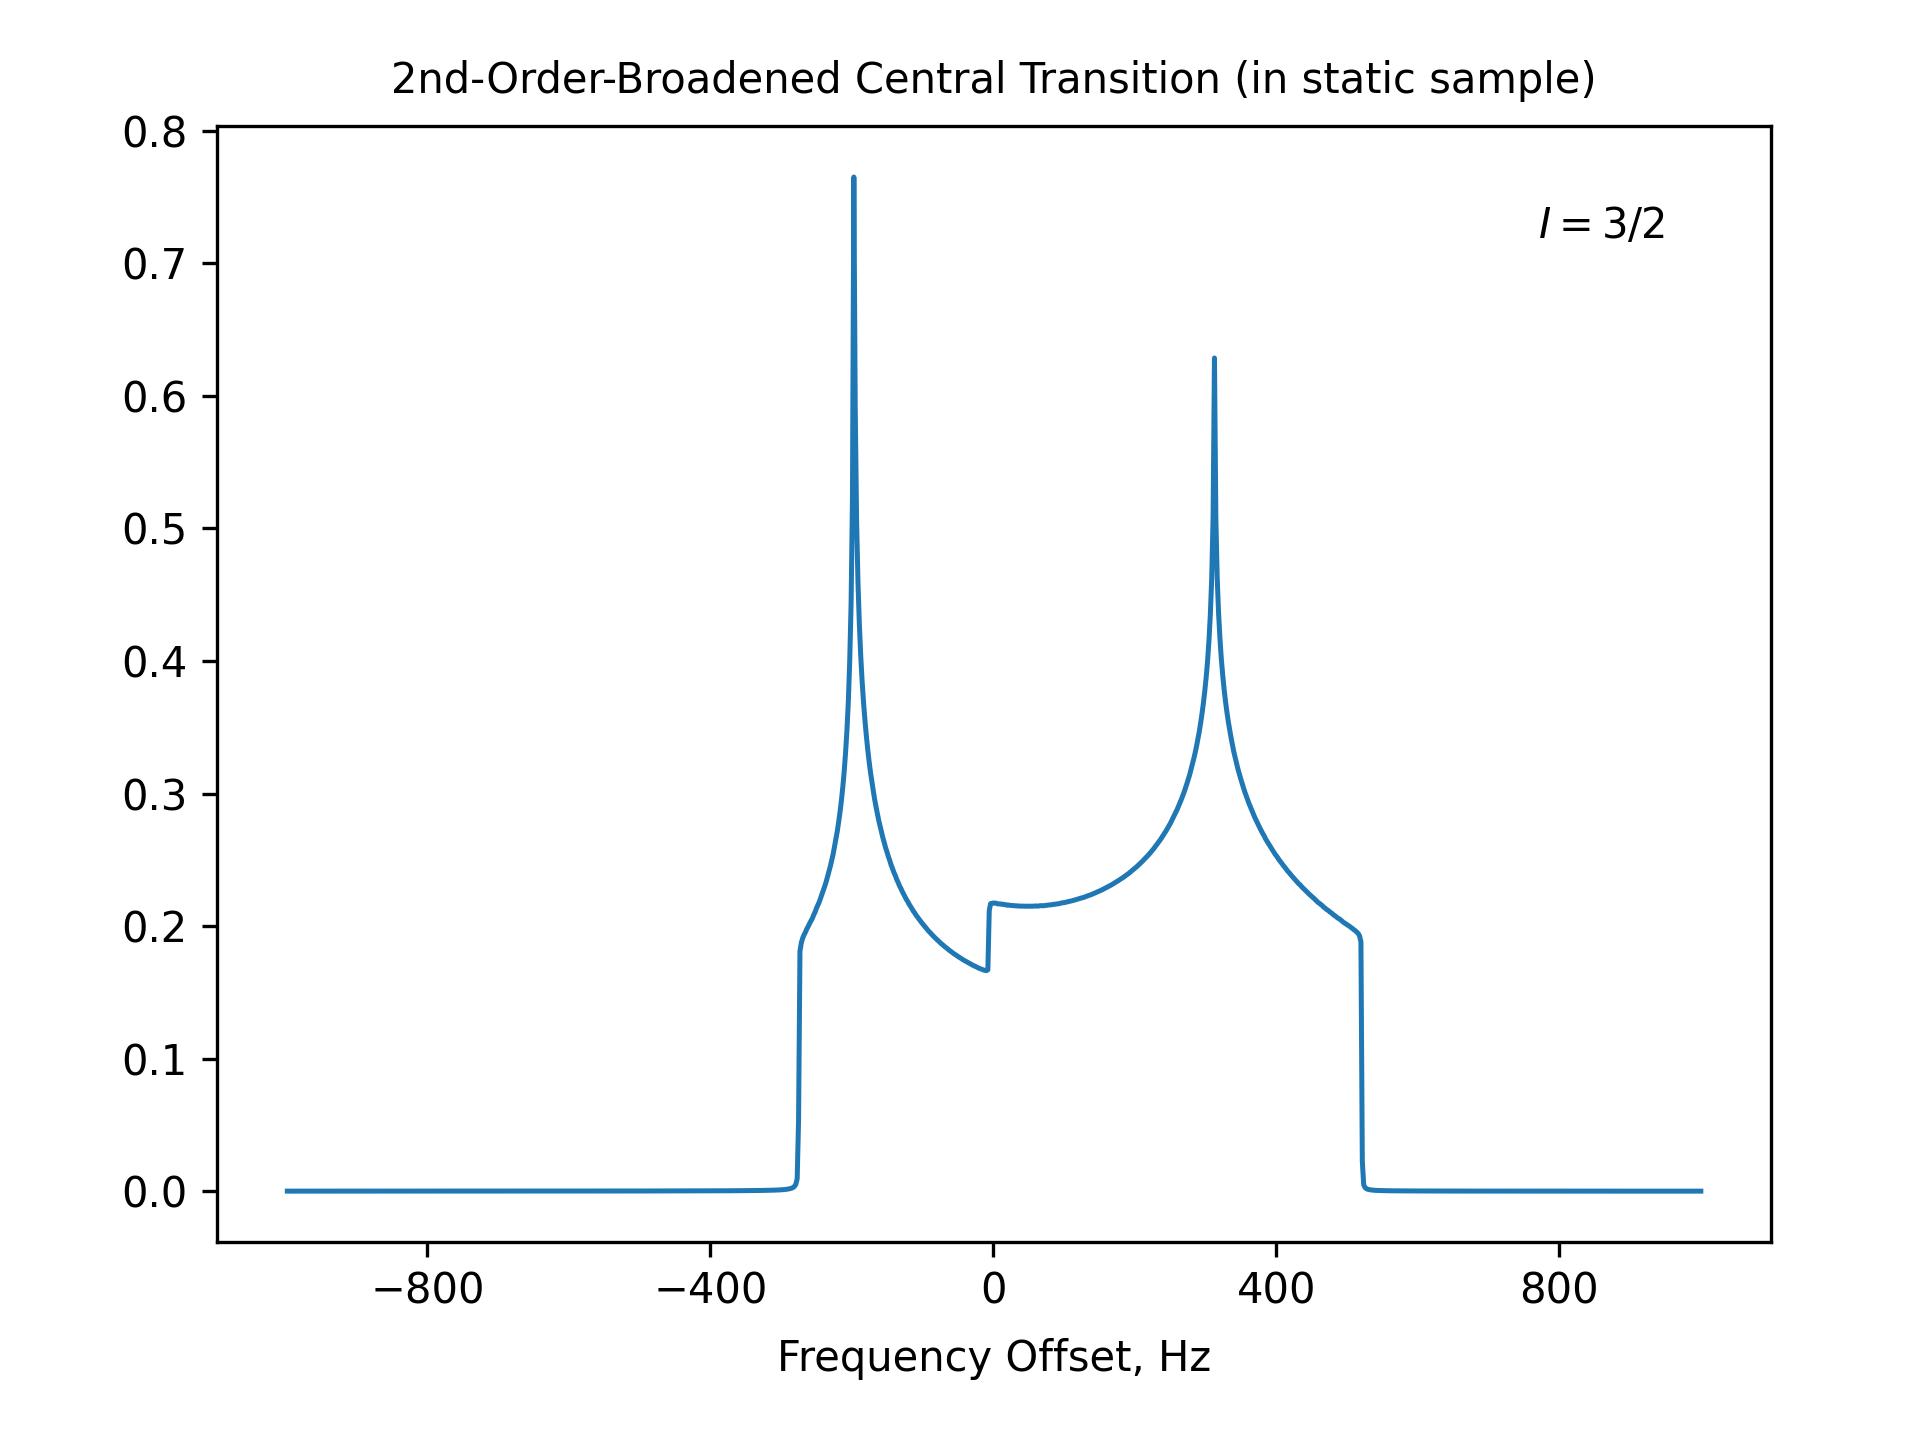 2nd-Order-Broadened Central Transition (in static sample)